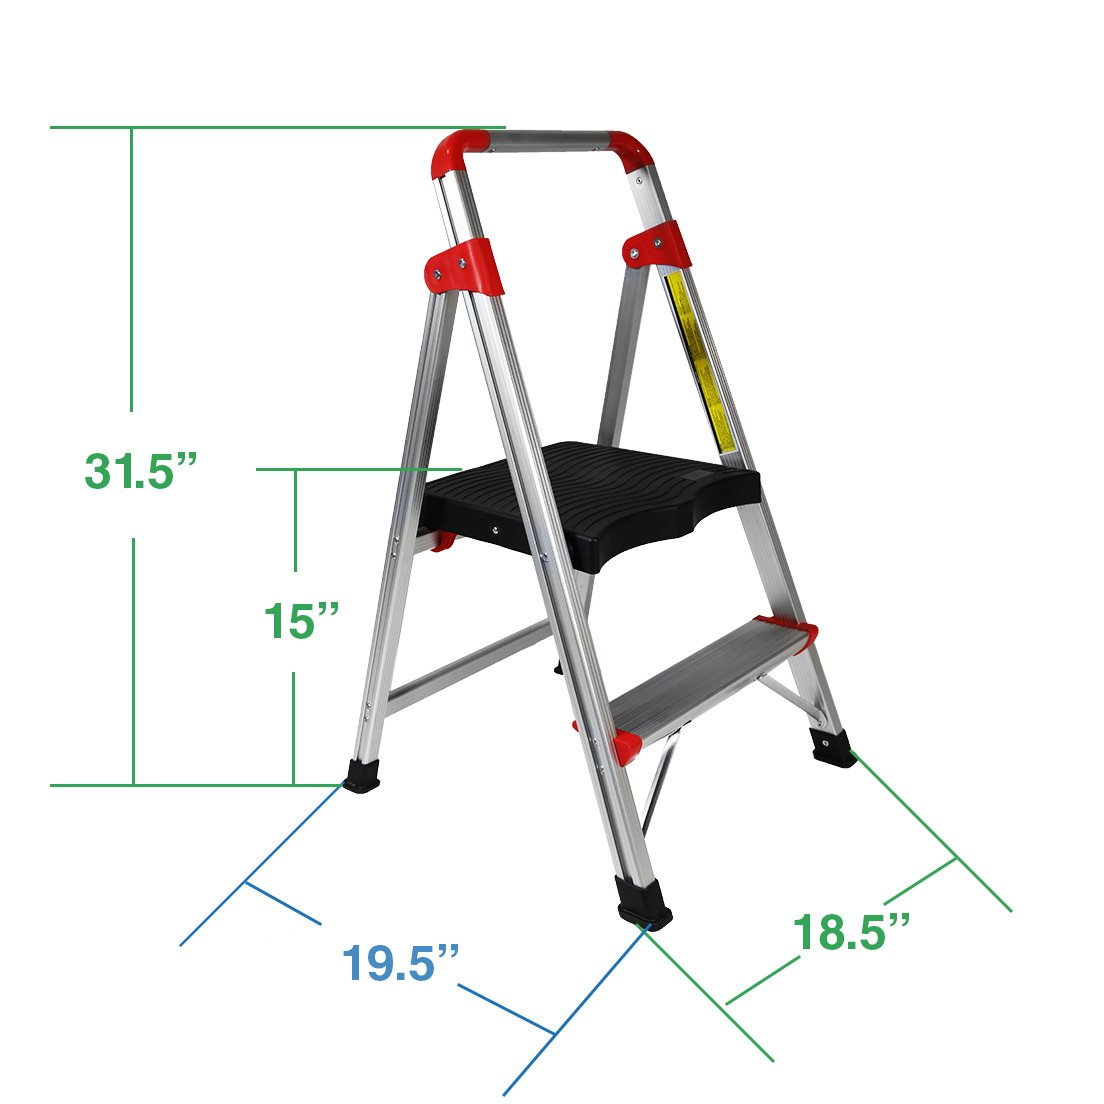 Clevr 2 Step Aluminum Ladder 33'' Non-slip Platform Lightweight Folding Stool, 230 lbs. Capacity